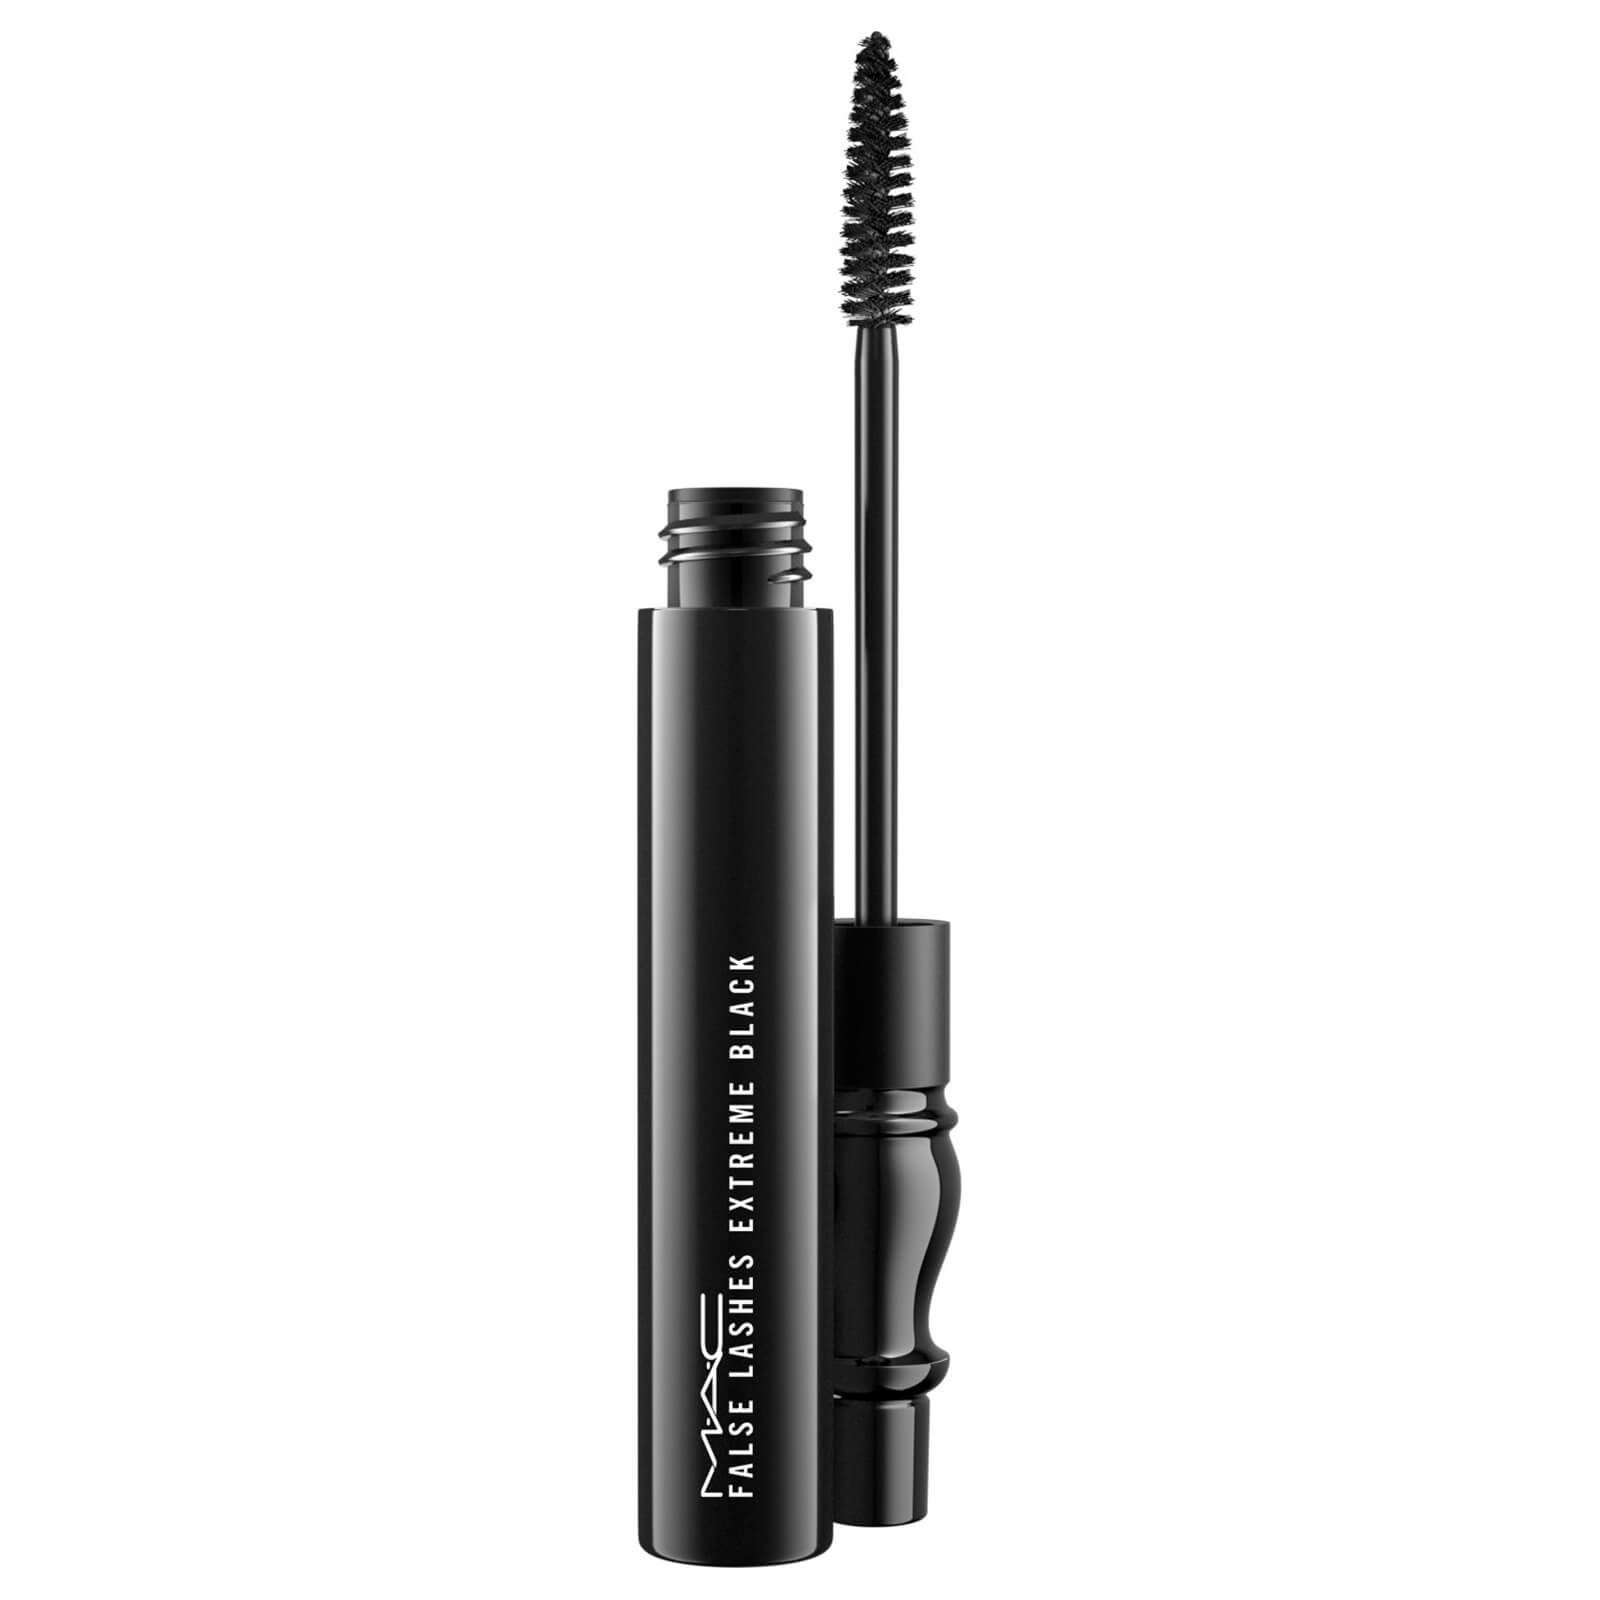 4a676f5faad MAC False Lashes Mascara - Carbon Black | Free Shipping | Lookfantastic